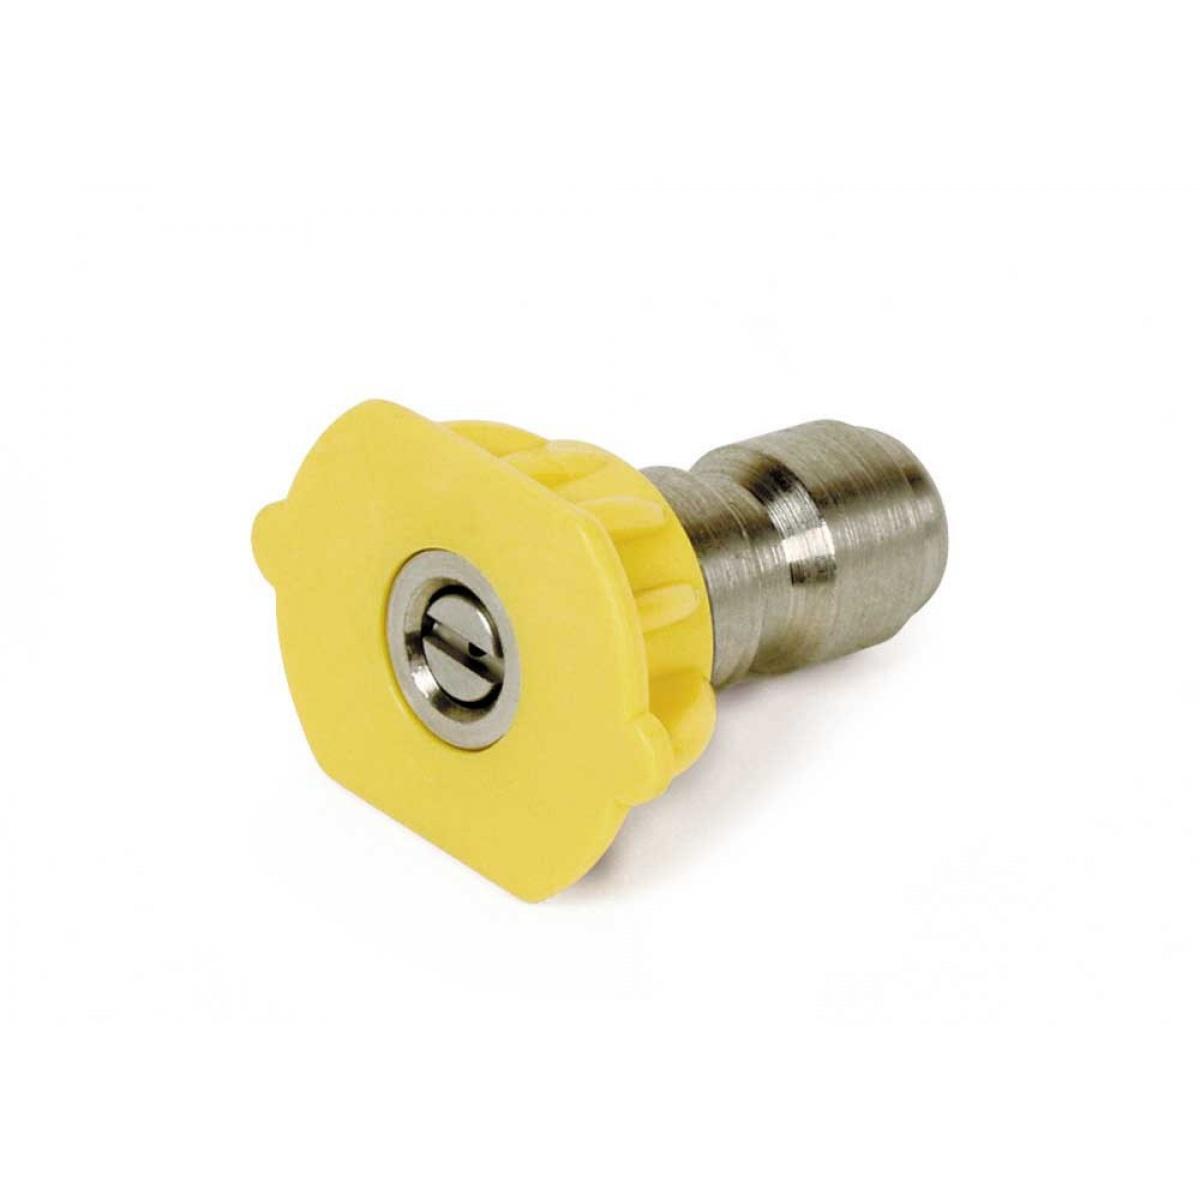 Nozzle Ss 1/4' #4.0x25 Q-style